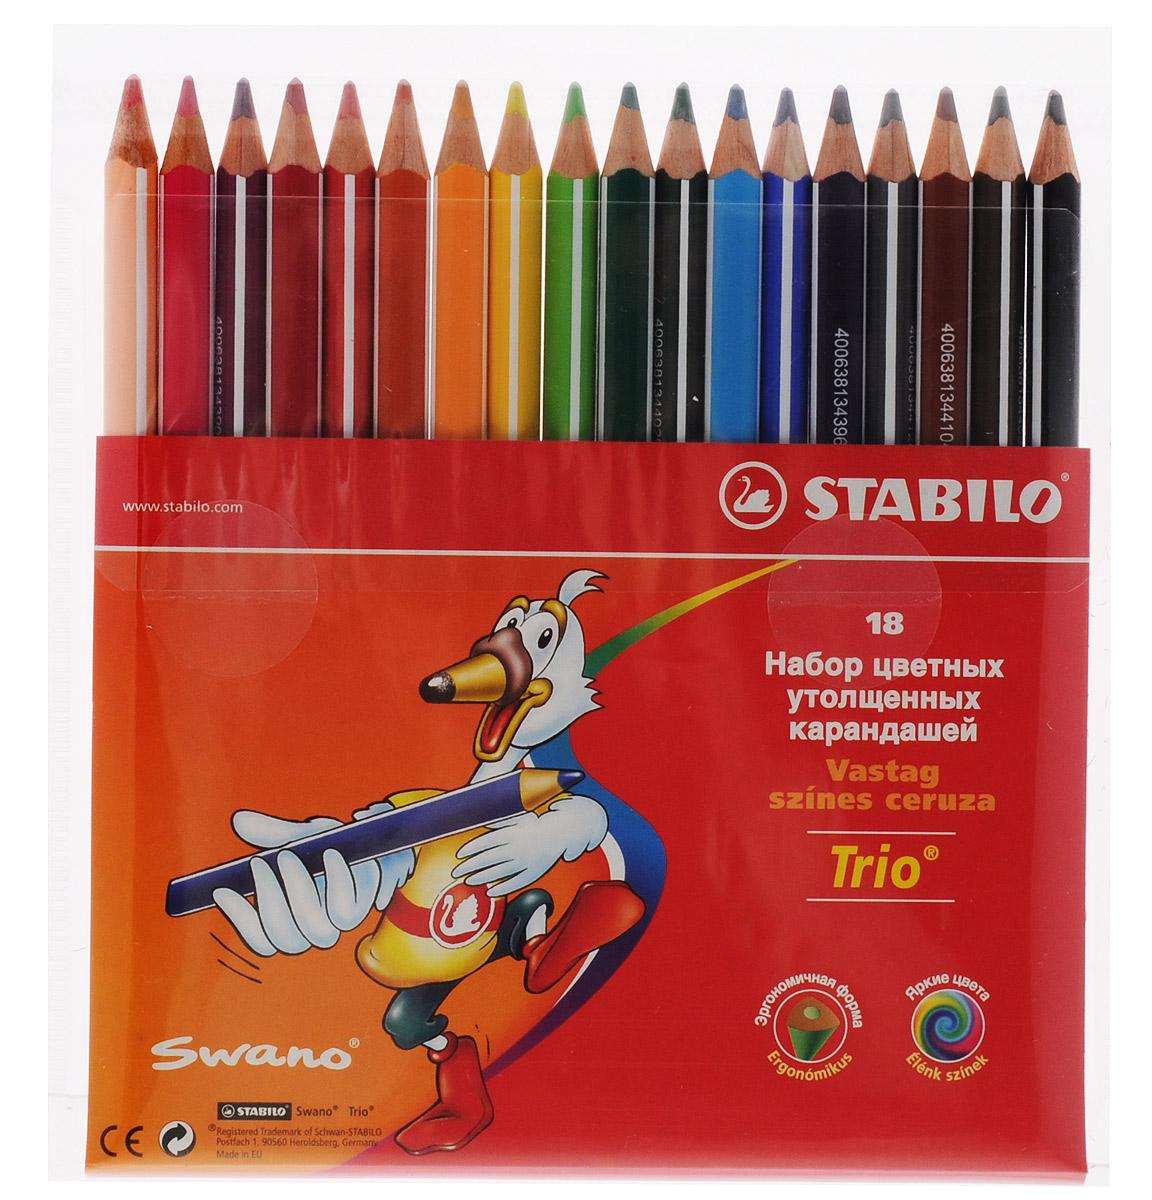 Stabilo Цветные карандаши Trio 18 цветов цветные карандаши stabilo 12 цветов